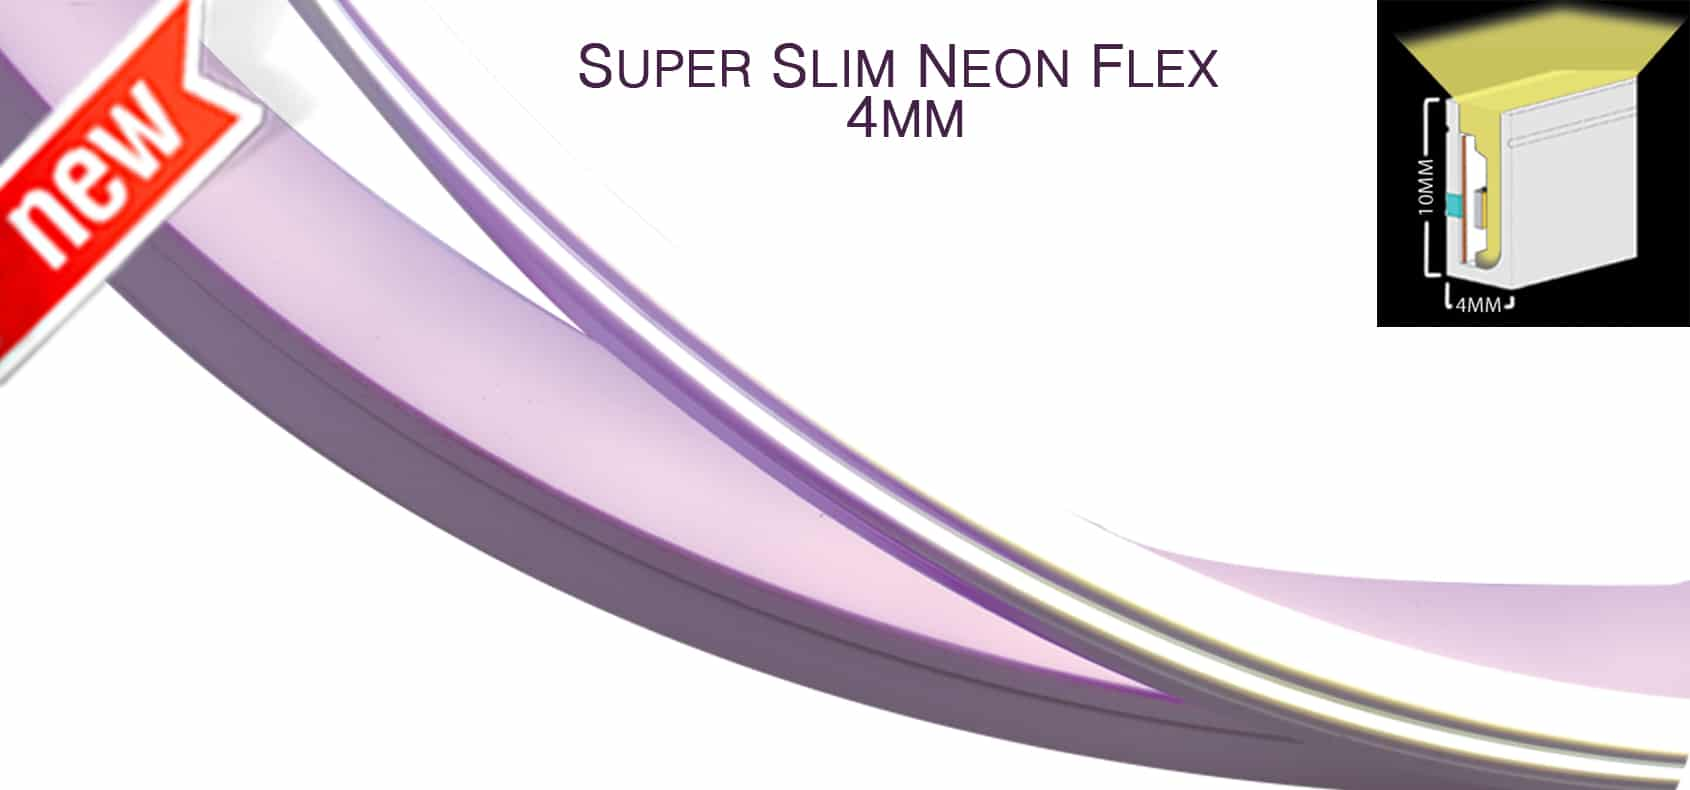 Neon Flex VEGA Web New copy